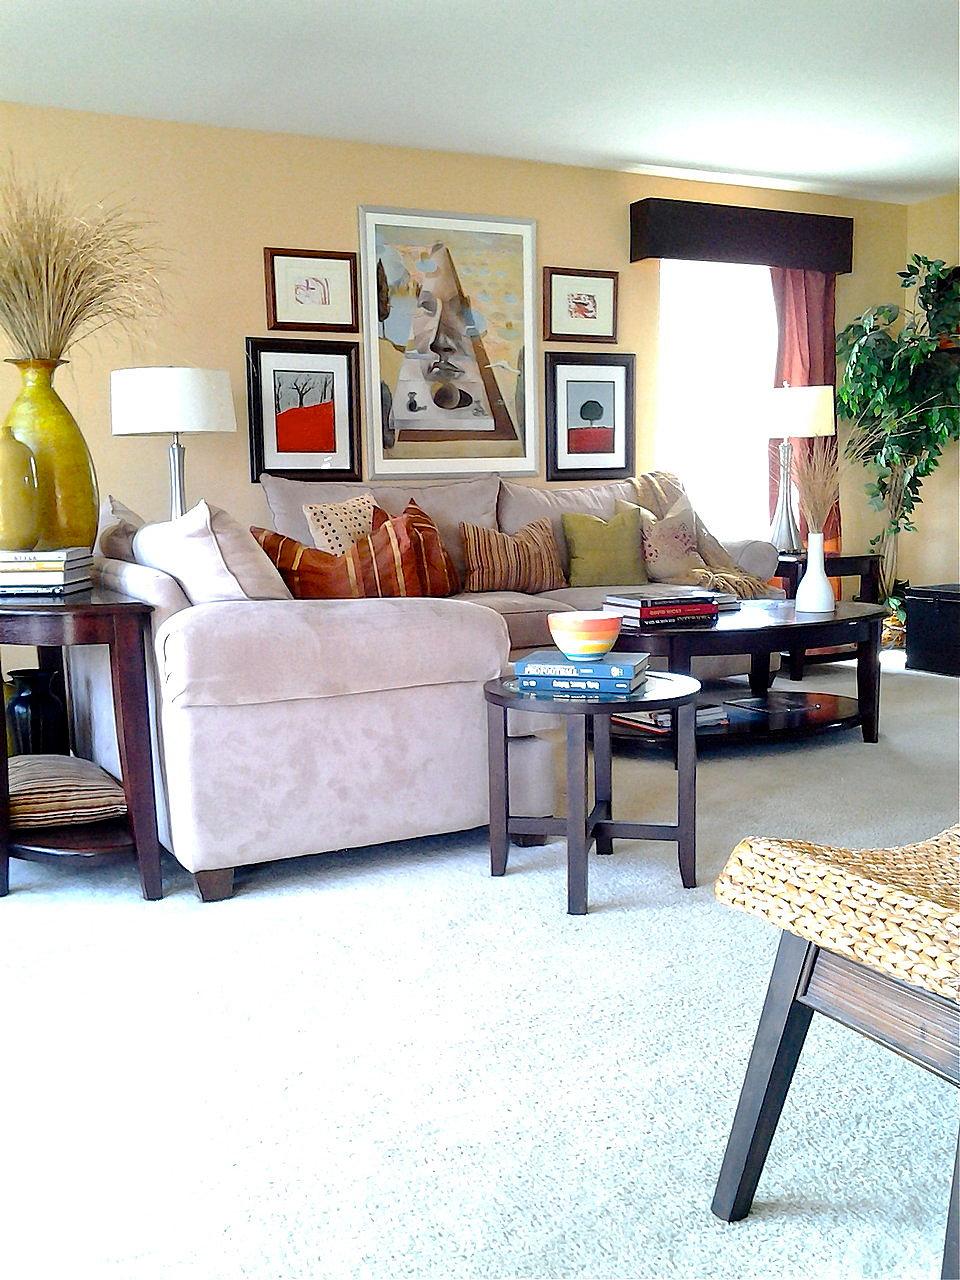 chicago interior designer interior design lake county